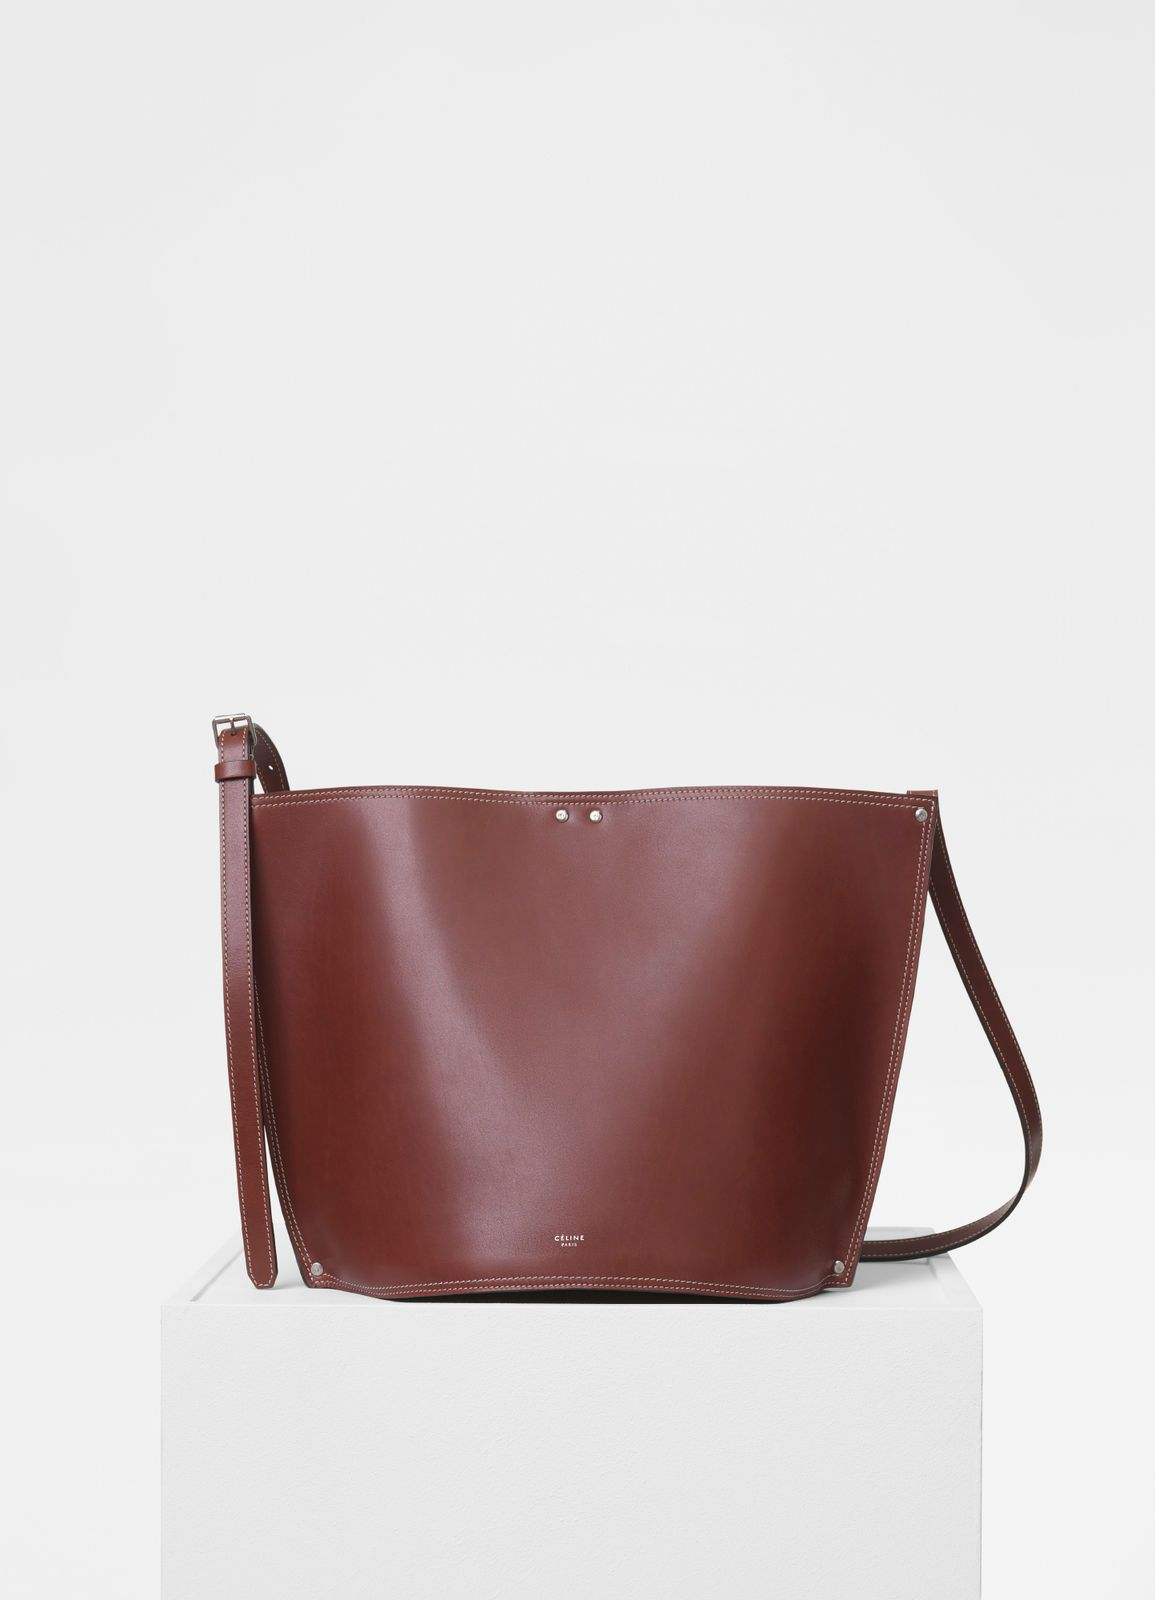 5c7035fa40fe Small Studs Bucket in satinated natural calfskin - Handbags